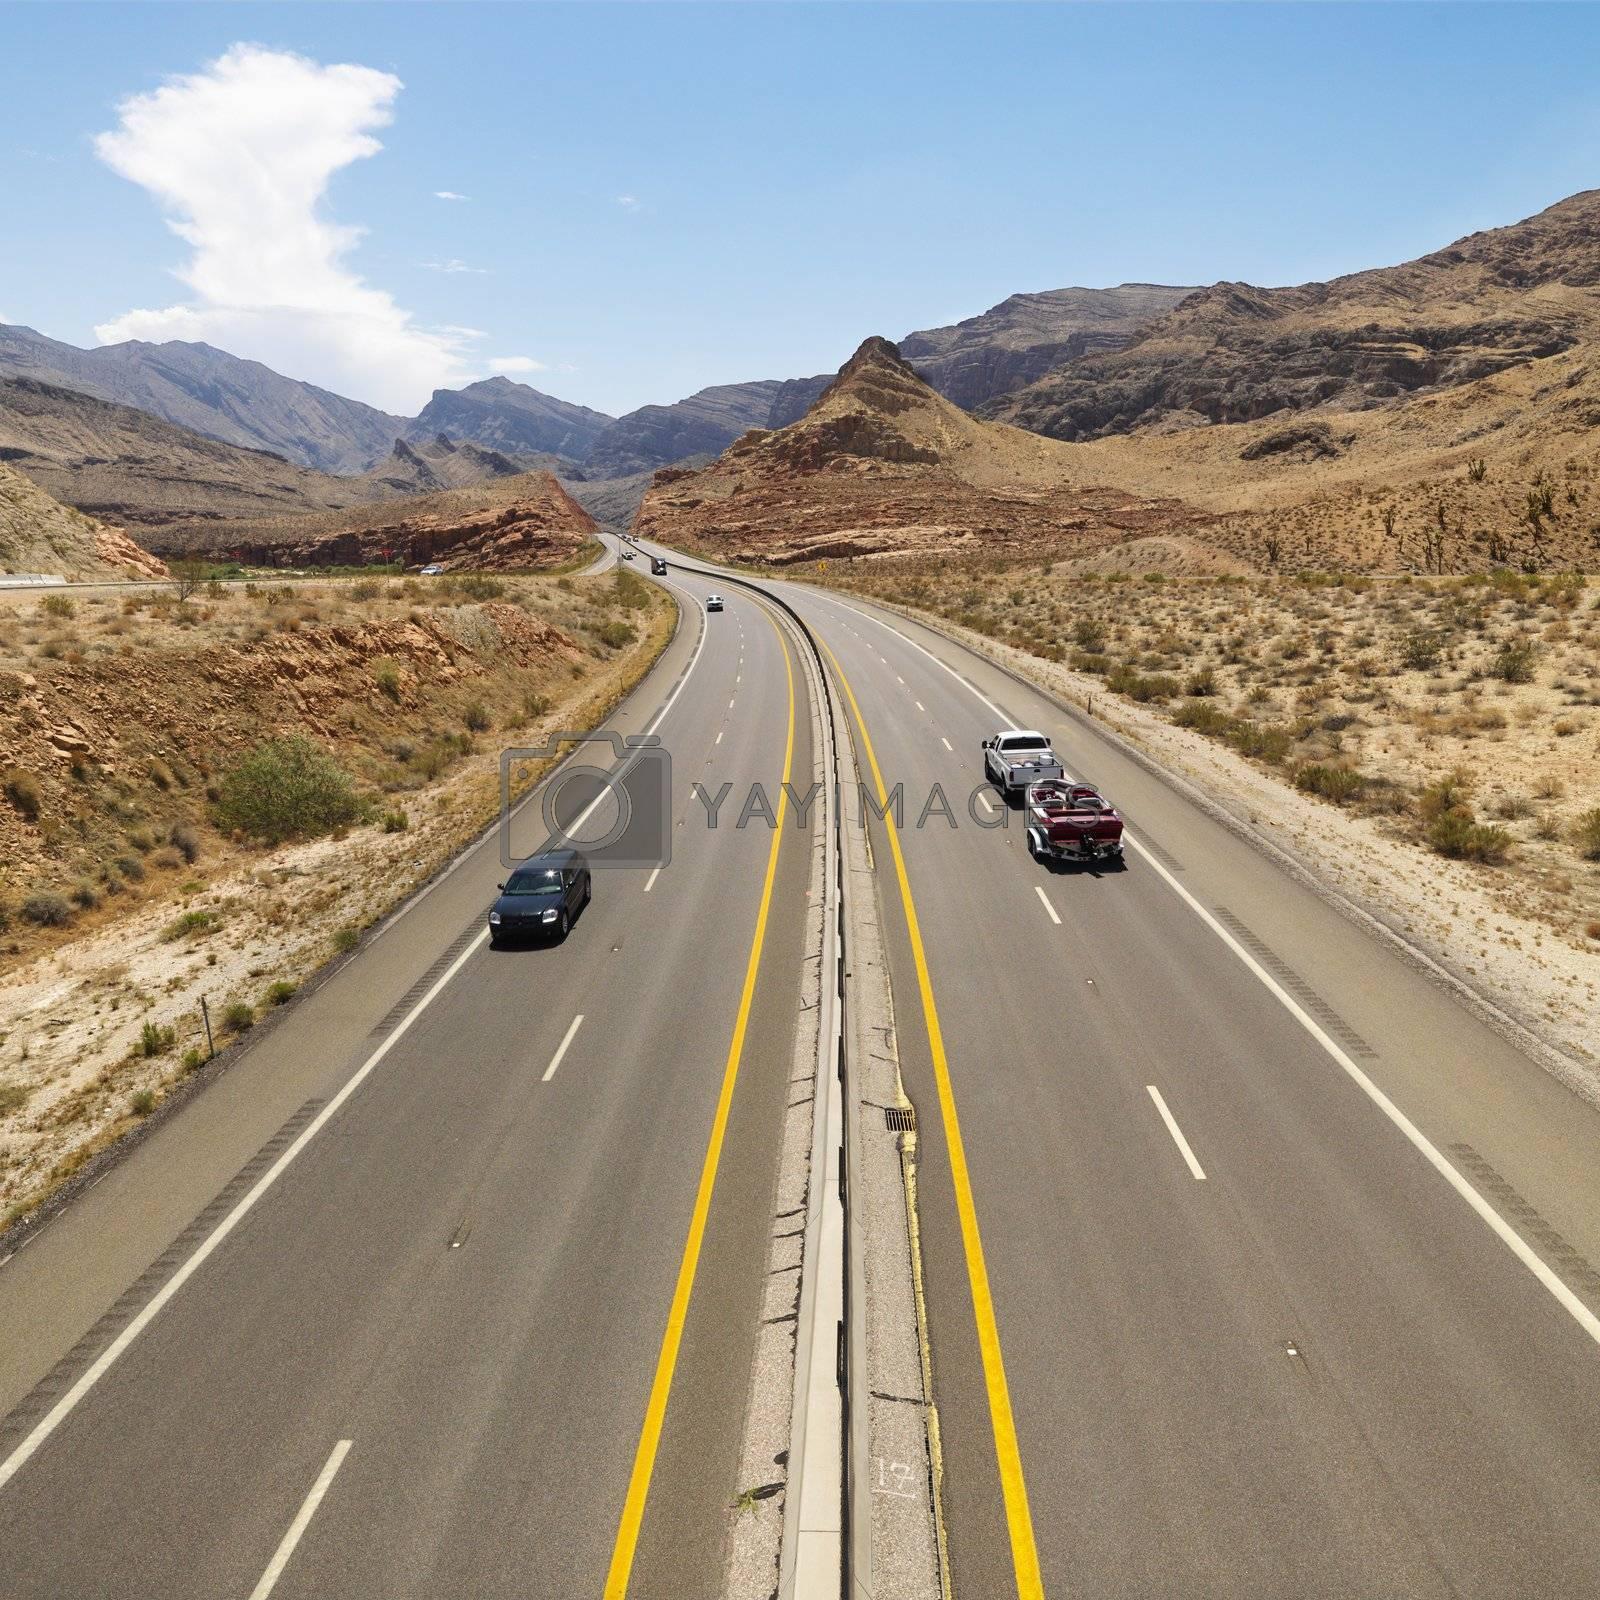 Birds eye view of automobiles on rural desert highway.